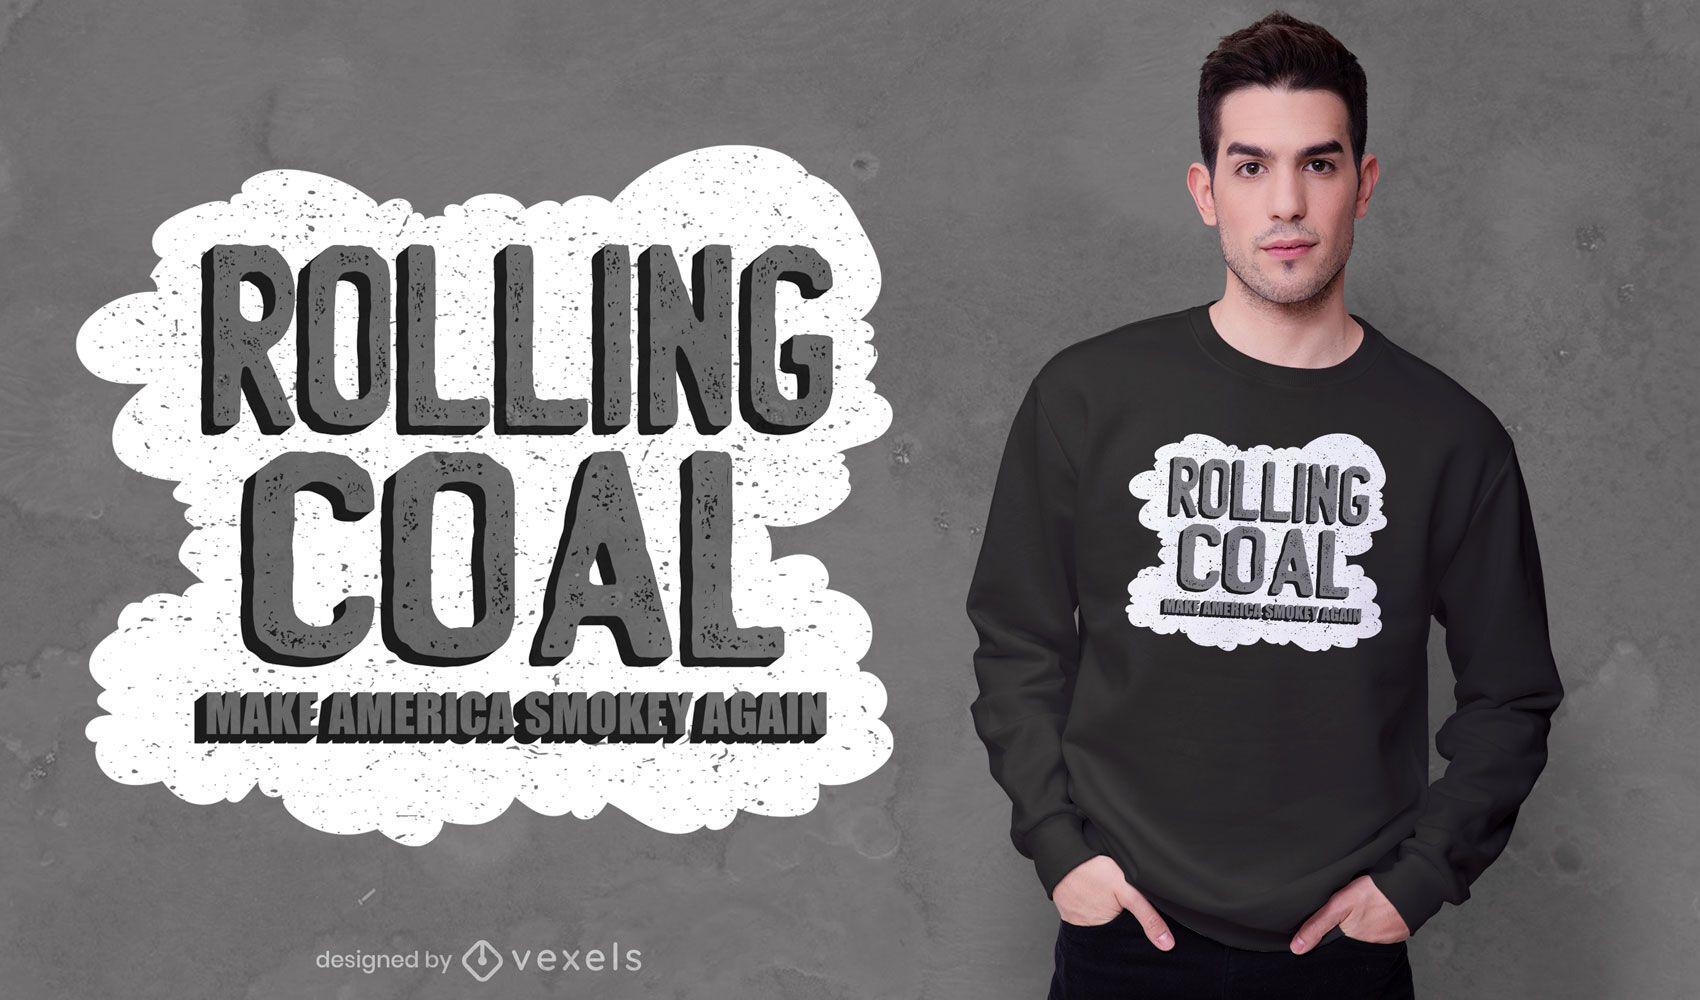 Rolling coal america quote t-shirt design